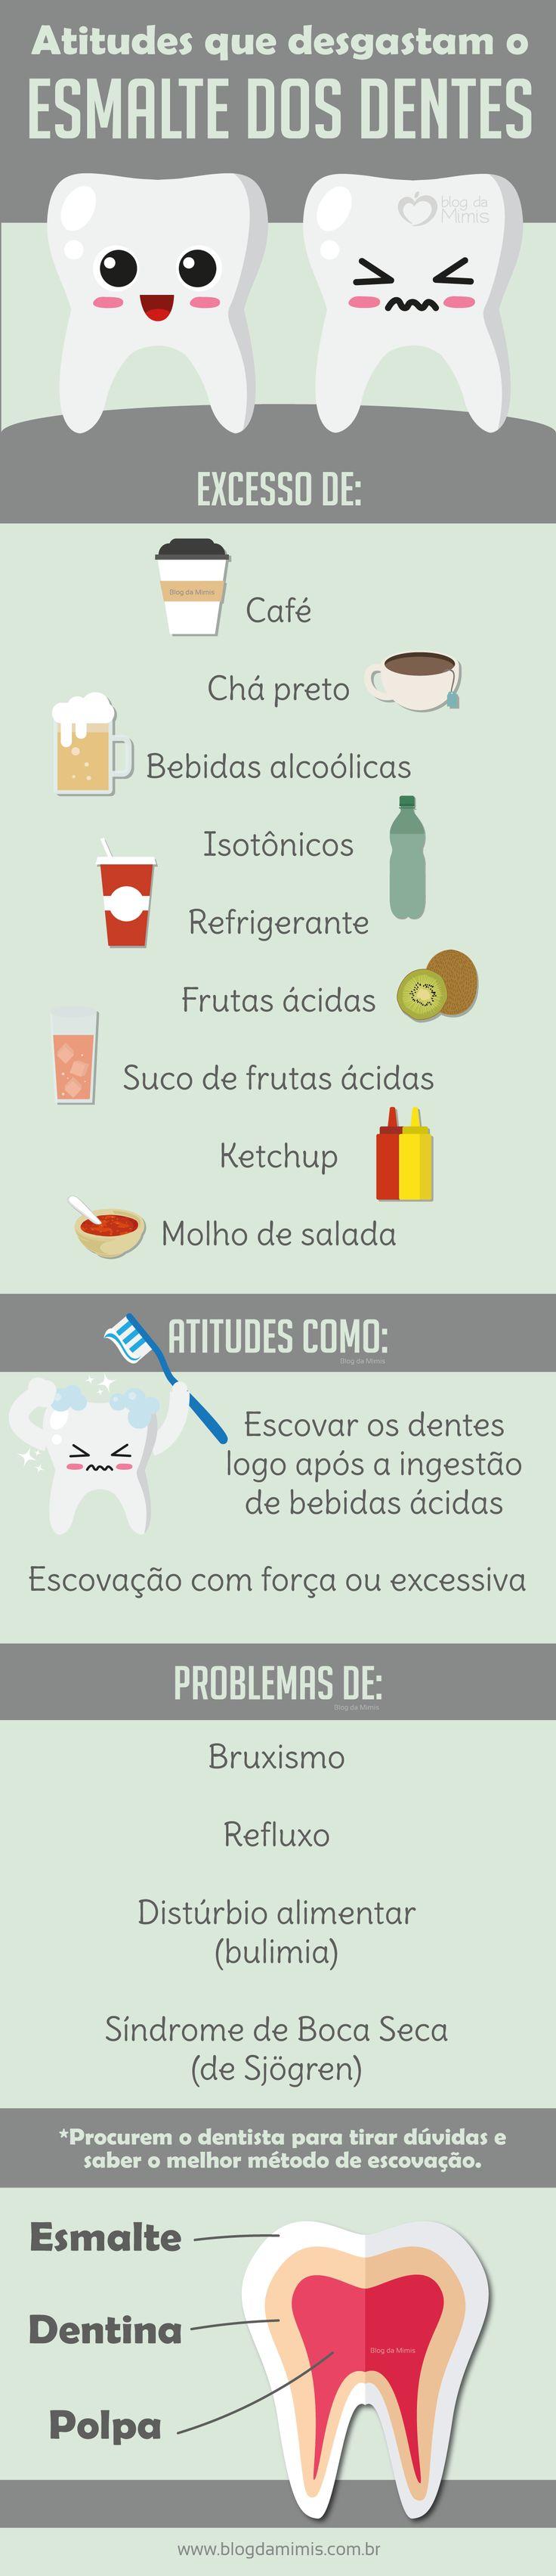 Atitudes que desgastam o esmalte dos dentes - Blog da Mimis #dentes #sensibilidade #esmalte #bucal #saúde